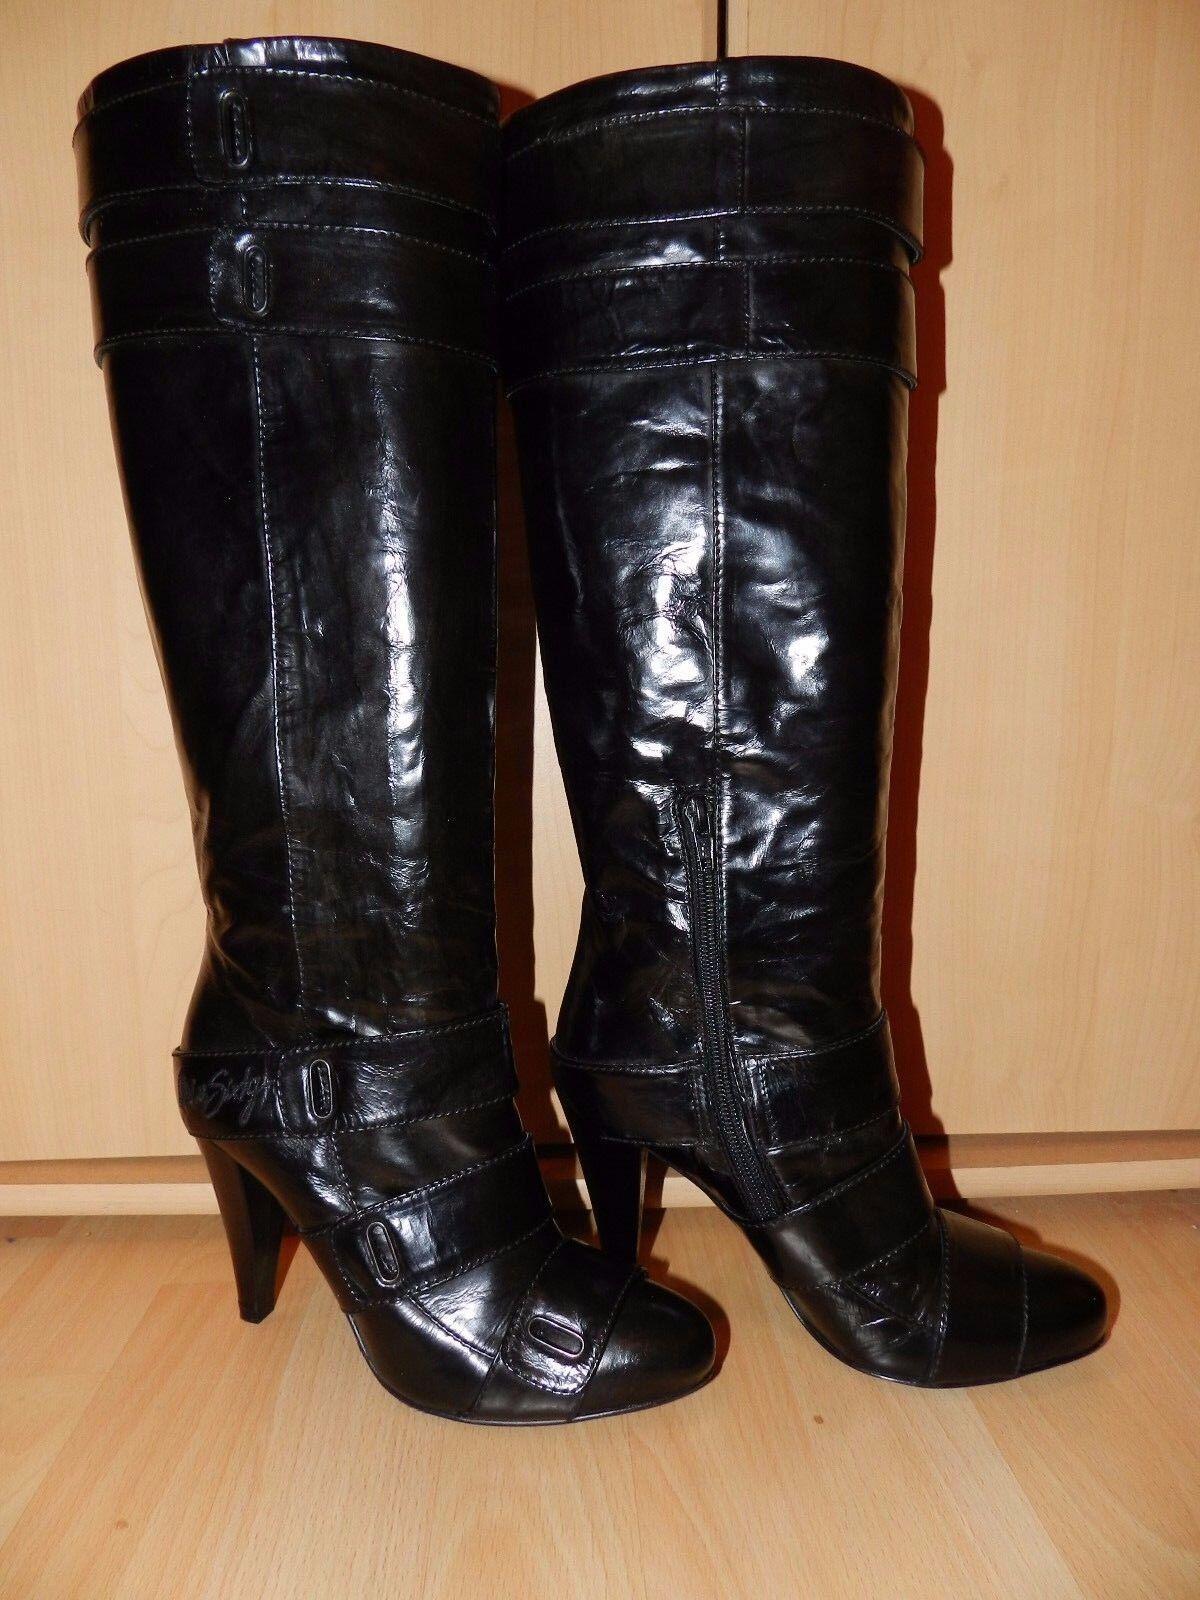 Sexy Miss Sixty High Heel Echt Lackleder Stiefel,Gr. 38, Absatz 10 cm Neuwertig